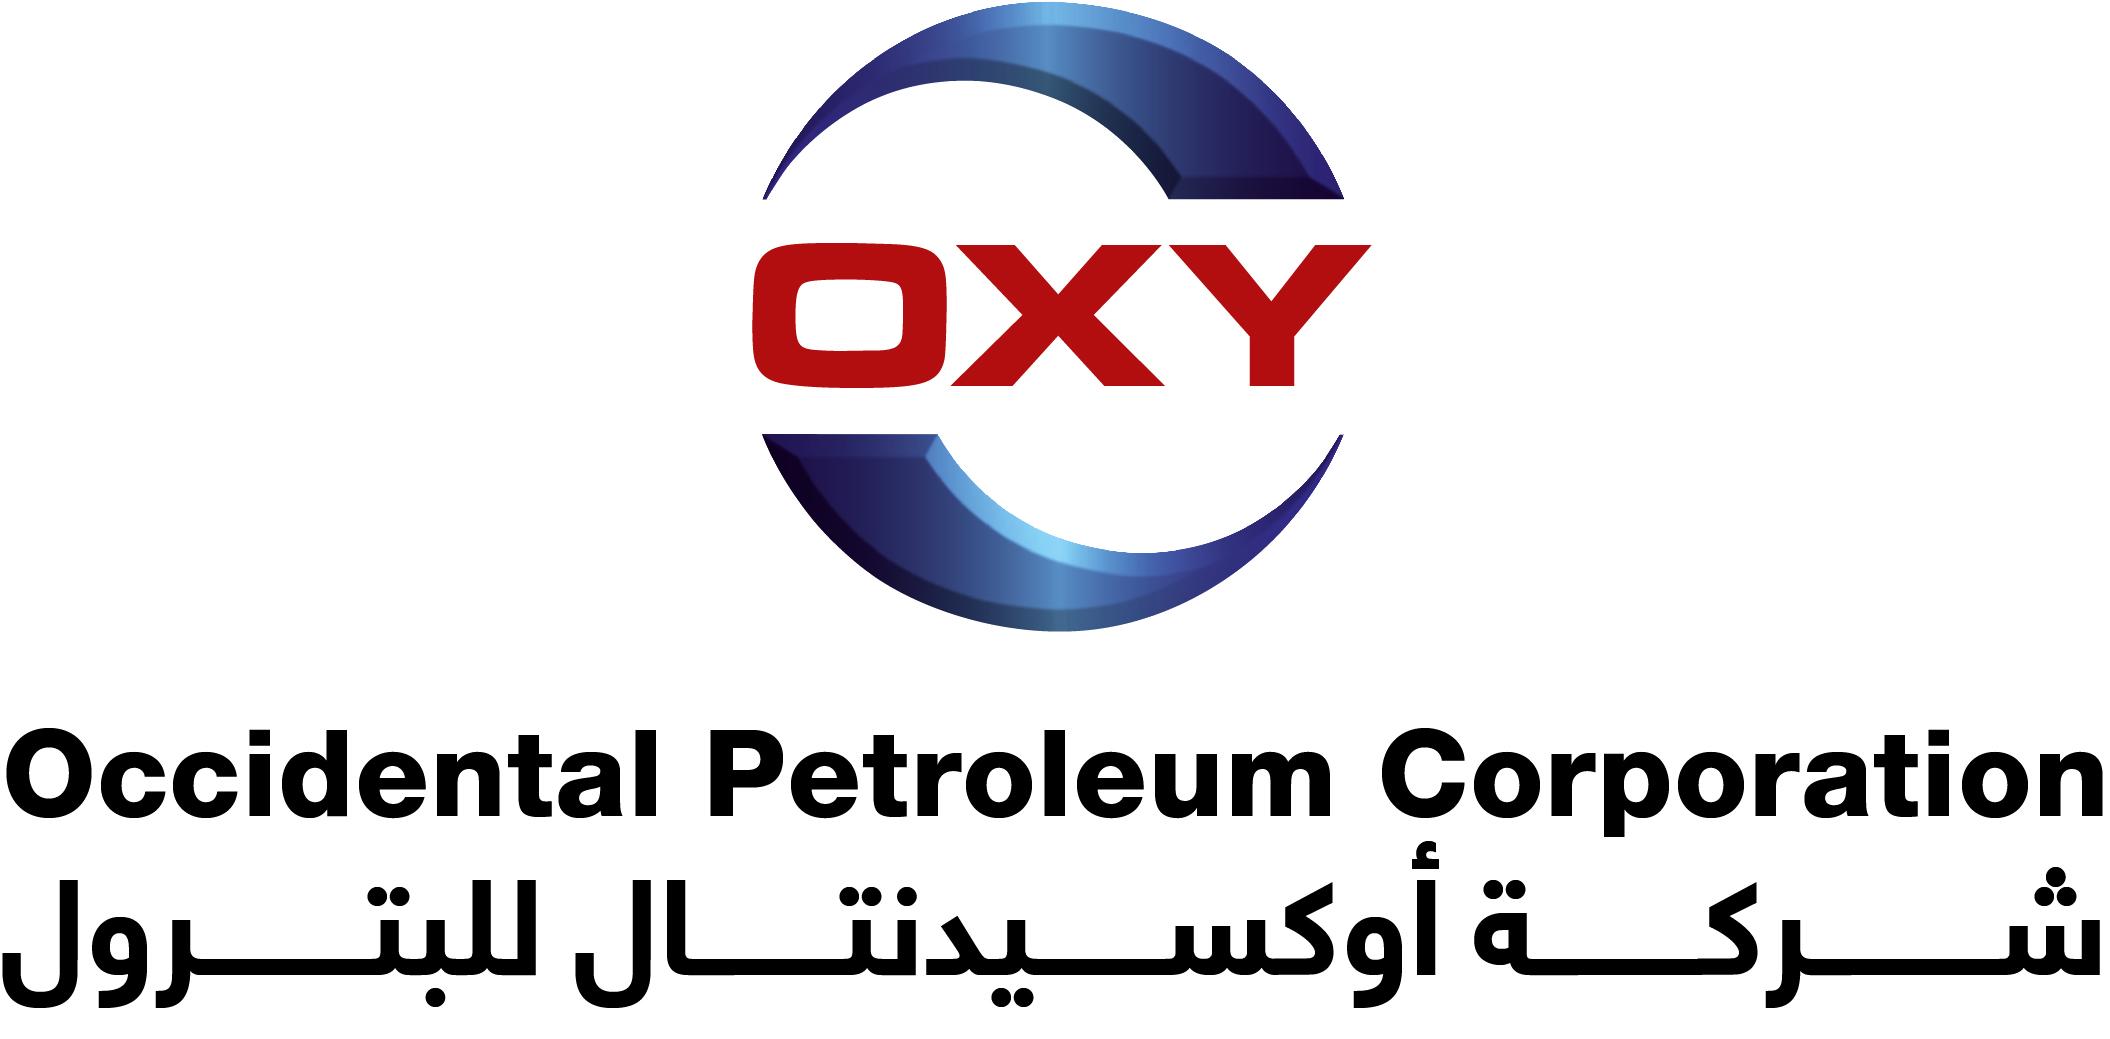 Oxy logos amcham abu dhabi american chamber of commerce abu dhabi publicscrutiny Image collections